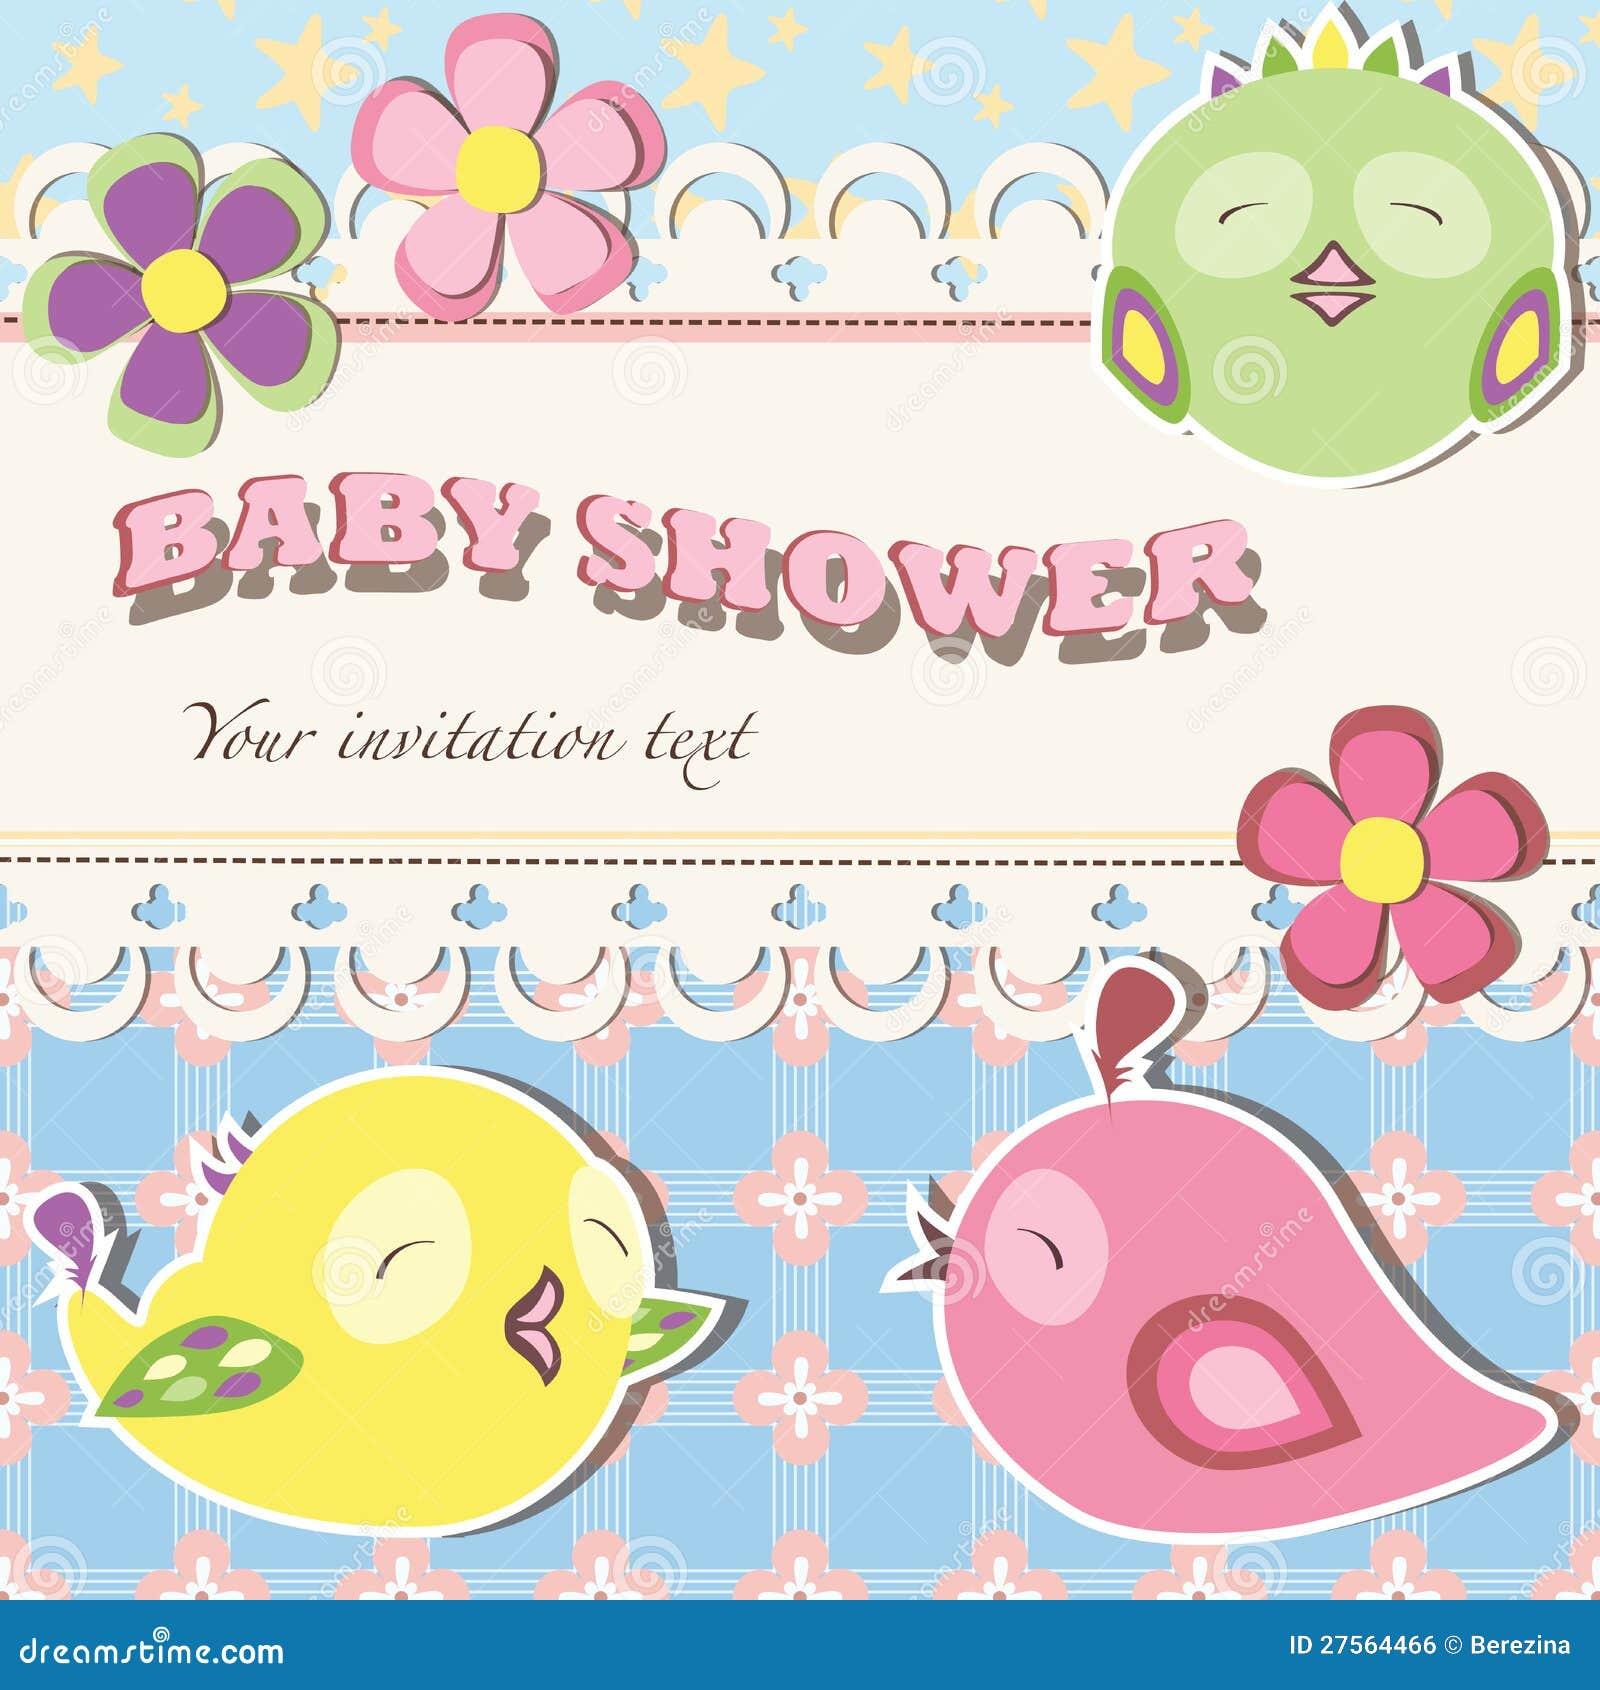 Baby Shower Invitation Postcard Royalty Free Stock Image ...